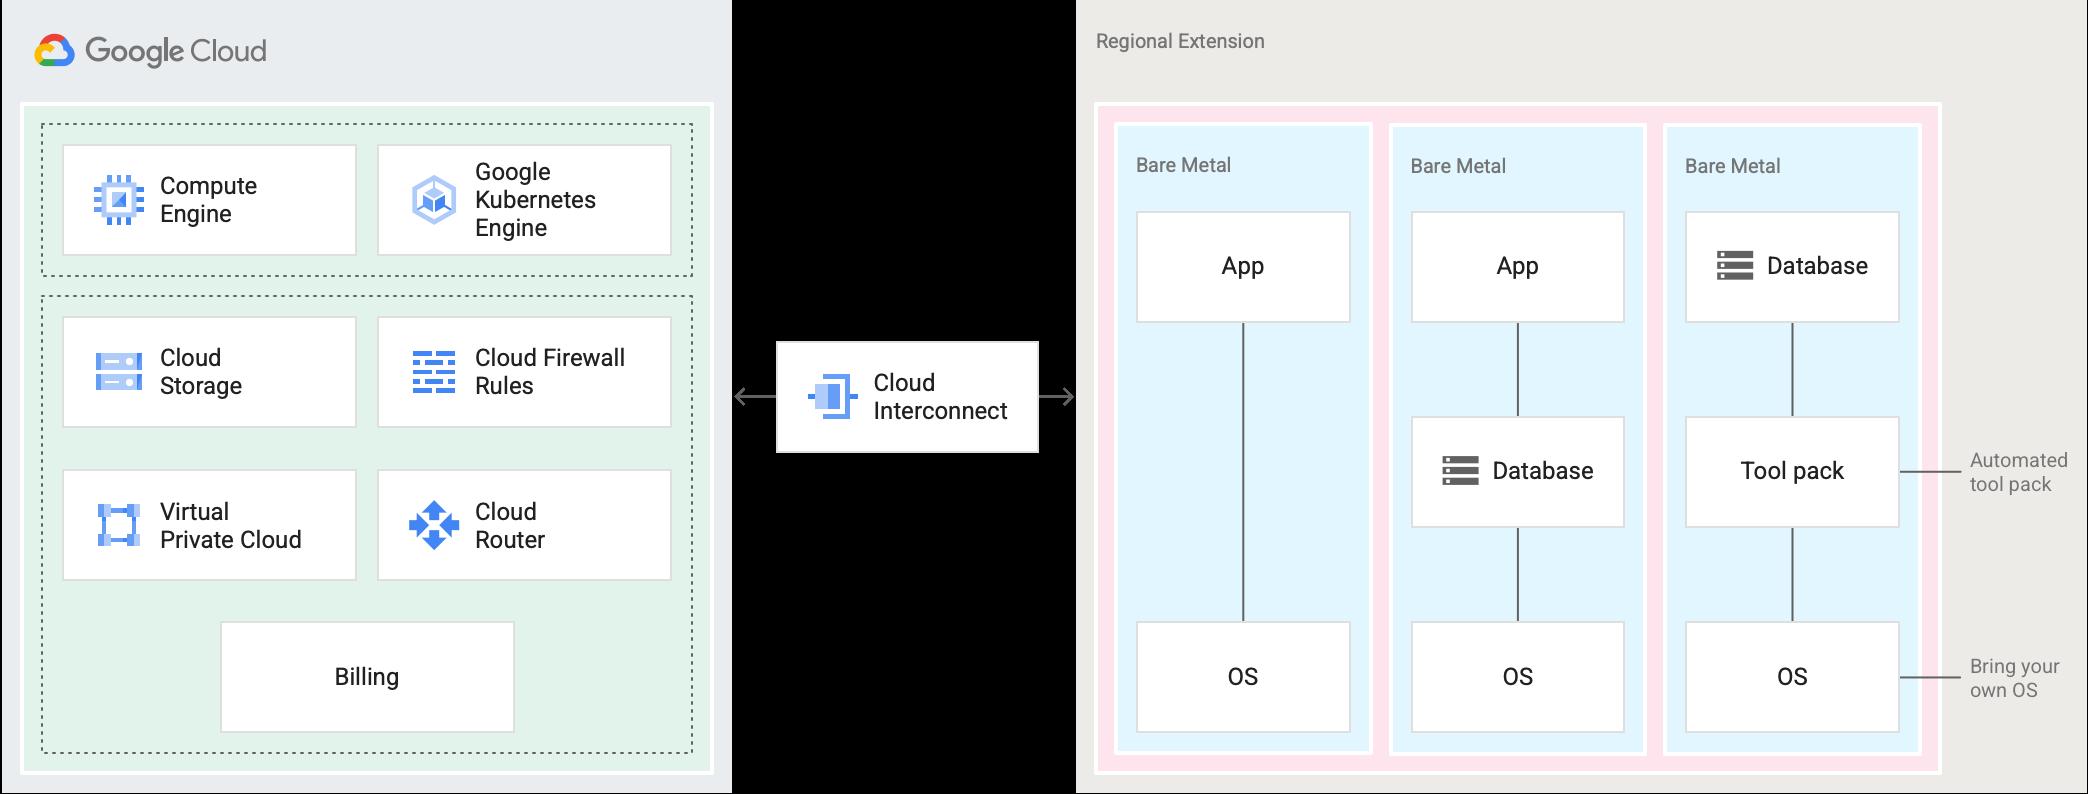 Bare Metal 服务器显示在与 Google Cloud 数据中心共存的地区扩展中